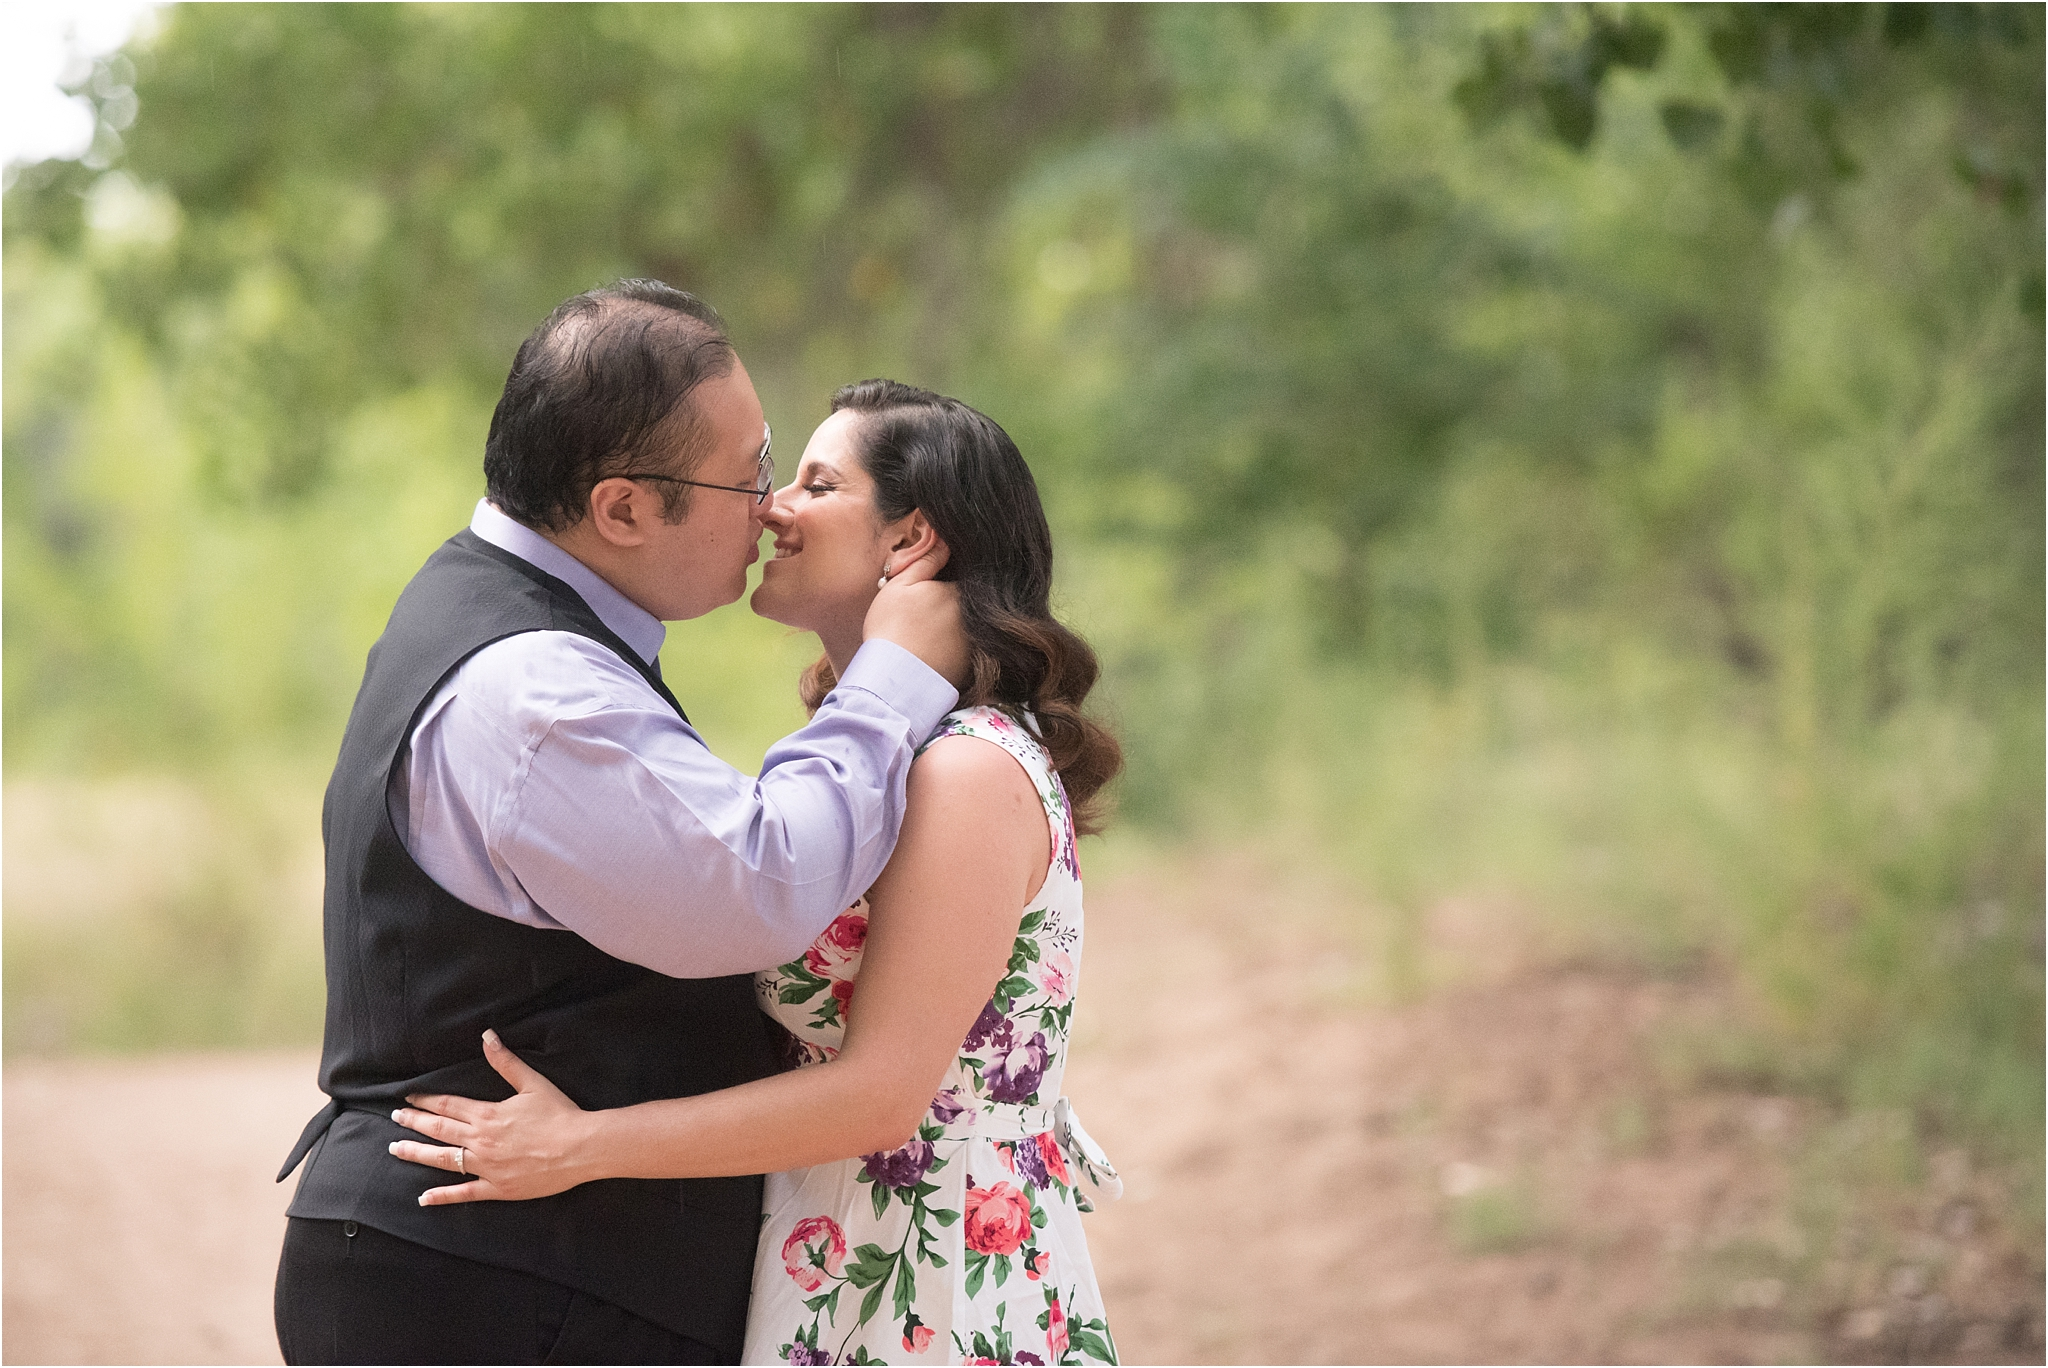 albuquerque wedding photographer, bosque engagement session, floral engagement dress, lavender and rose hair and makeup, engagement hair and makeup, new mexico wedding photographer